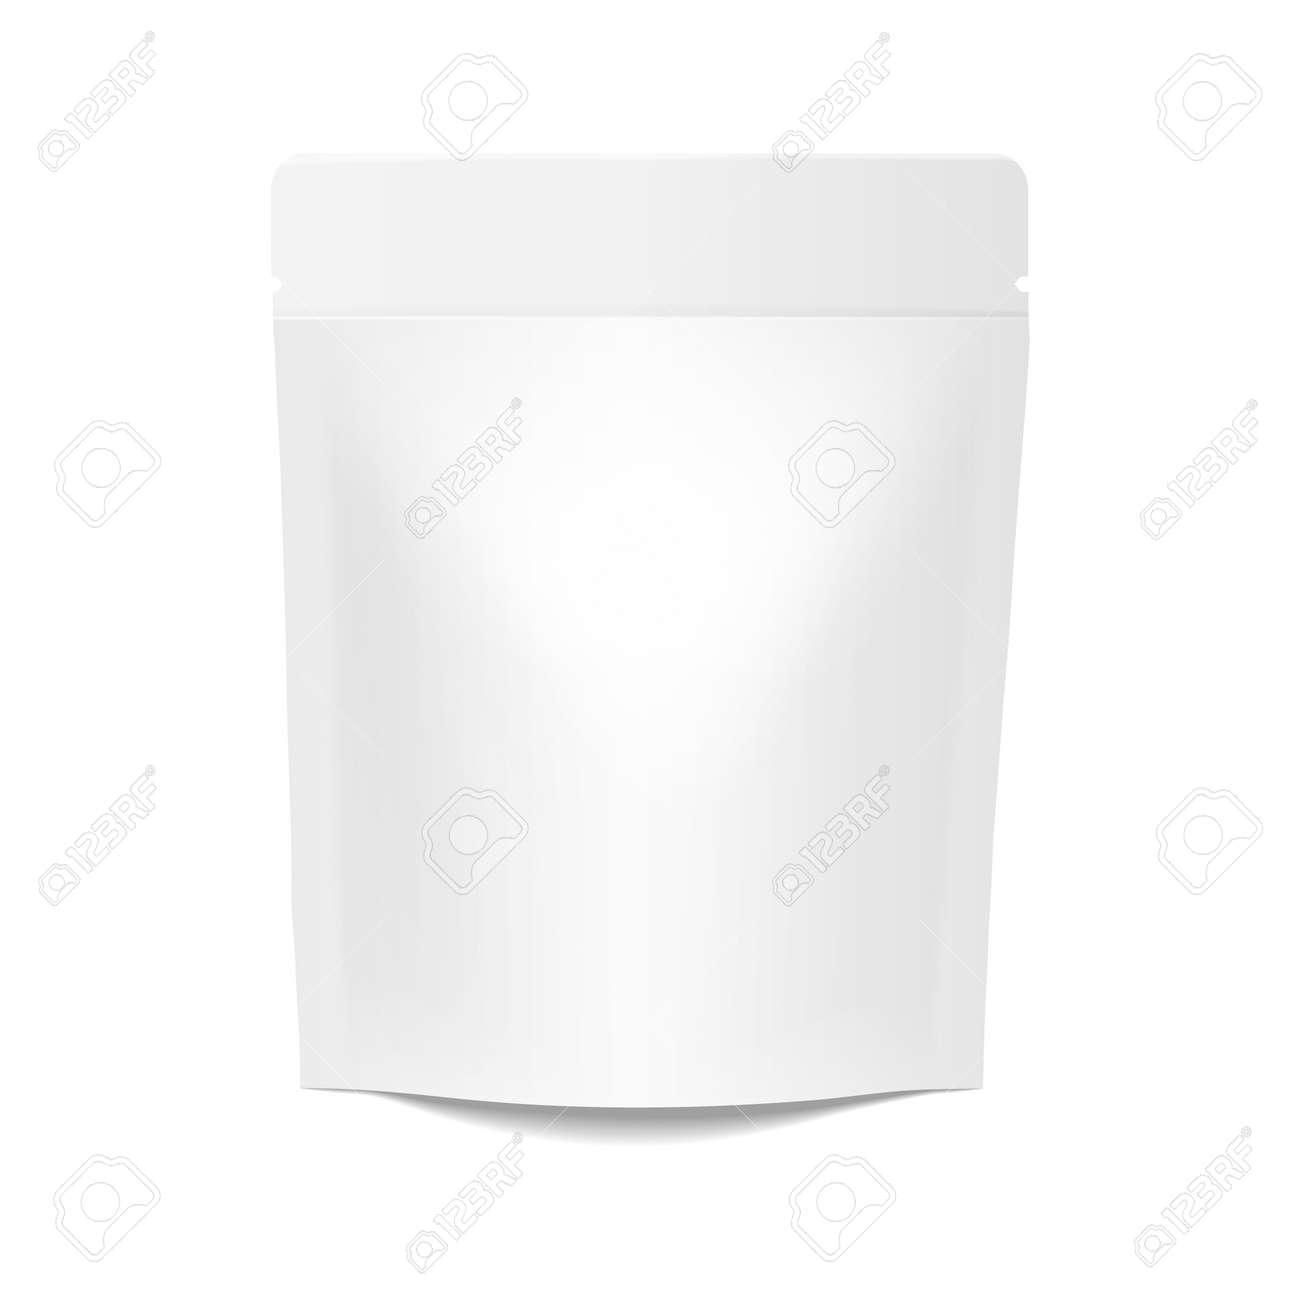 White realistic Polyethylene bag. Mock up for brand template - 166397372